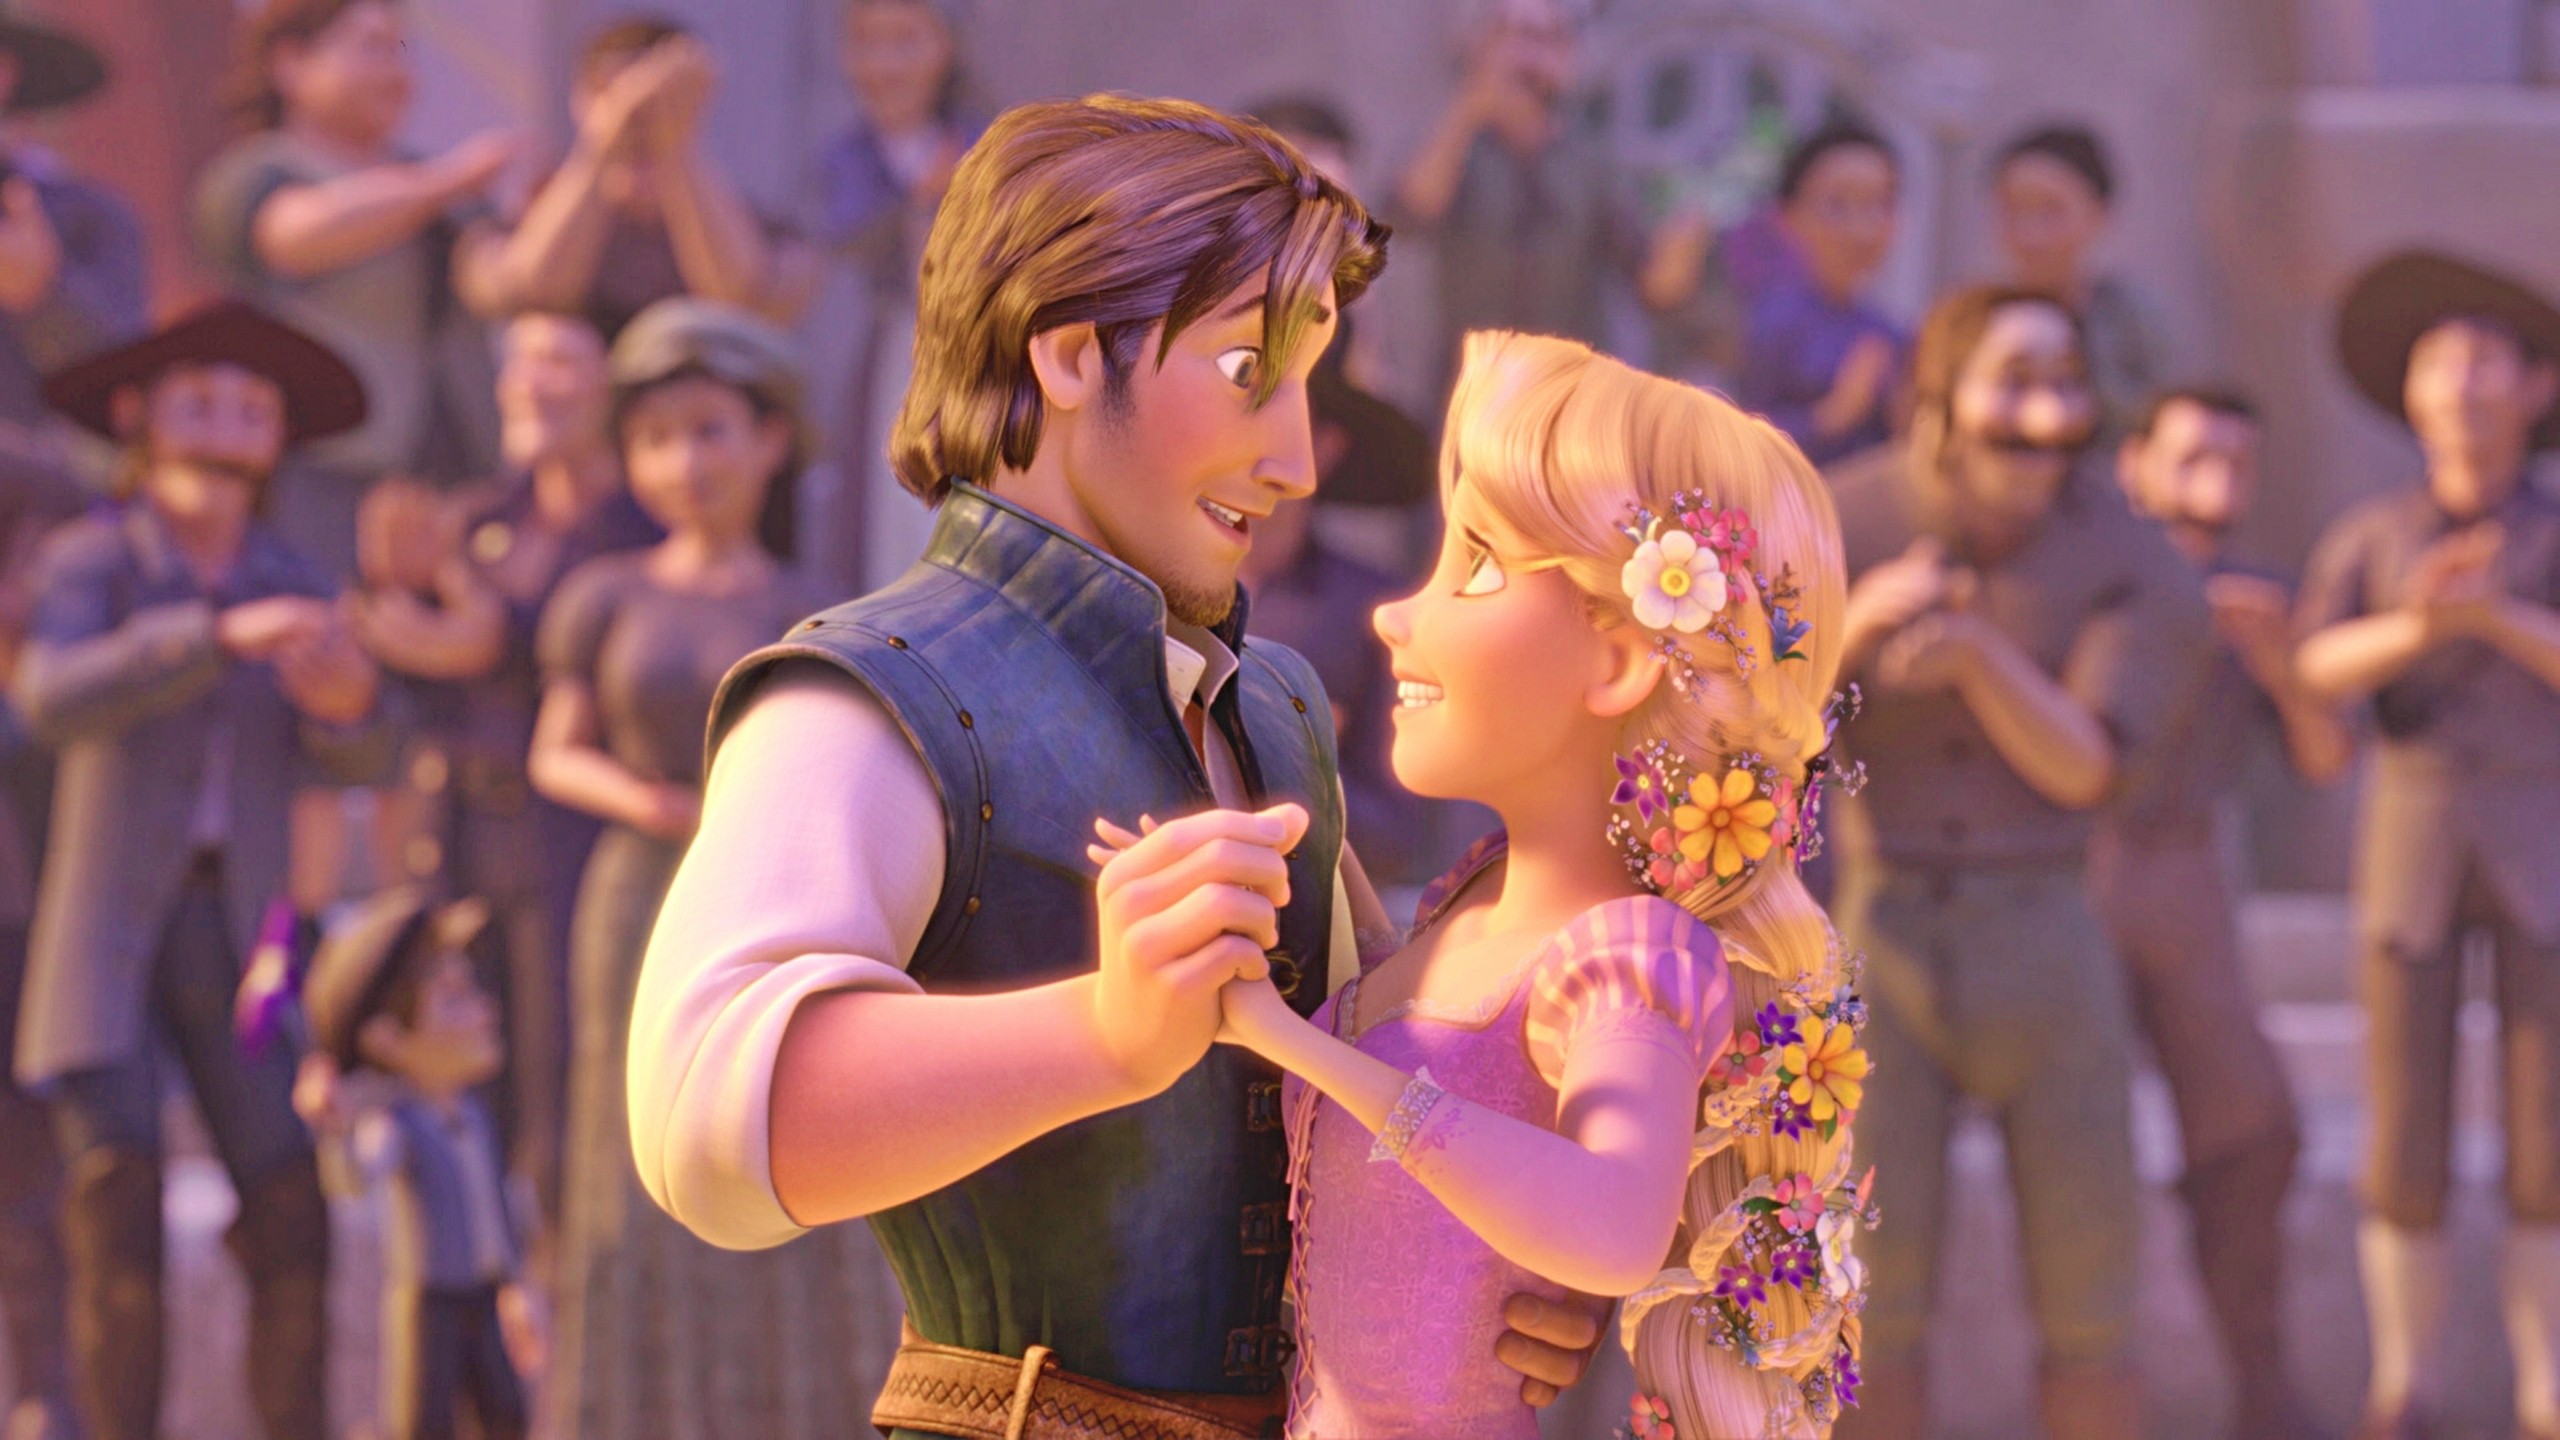 Flynn Rider And Rapunzel wallpaper   1404154 2560x1440